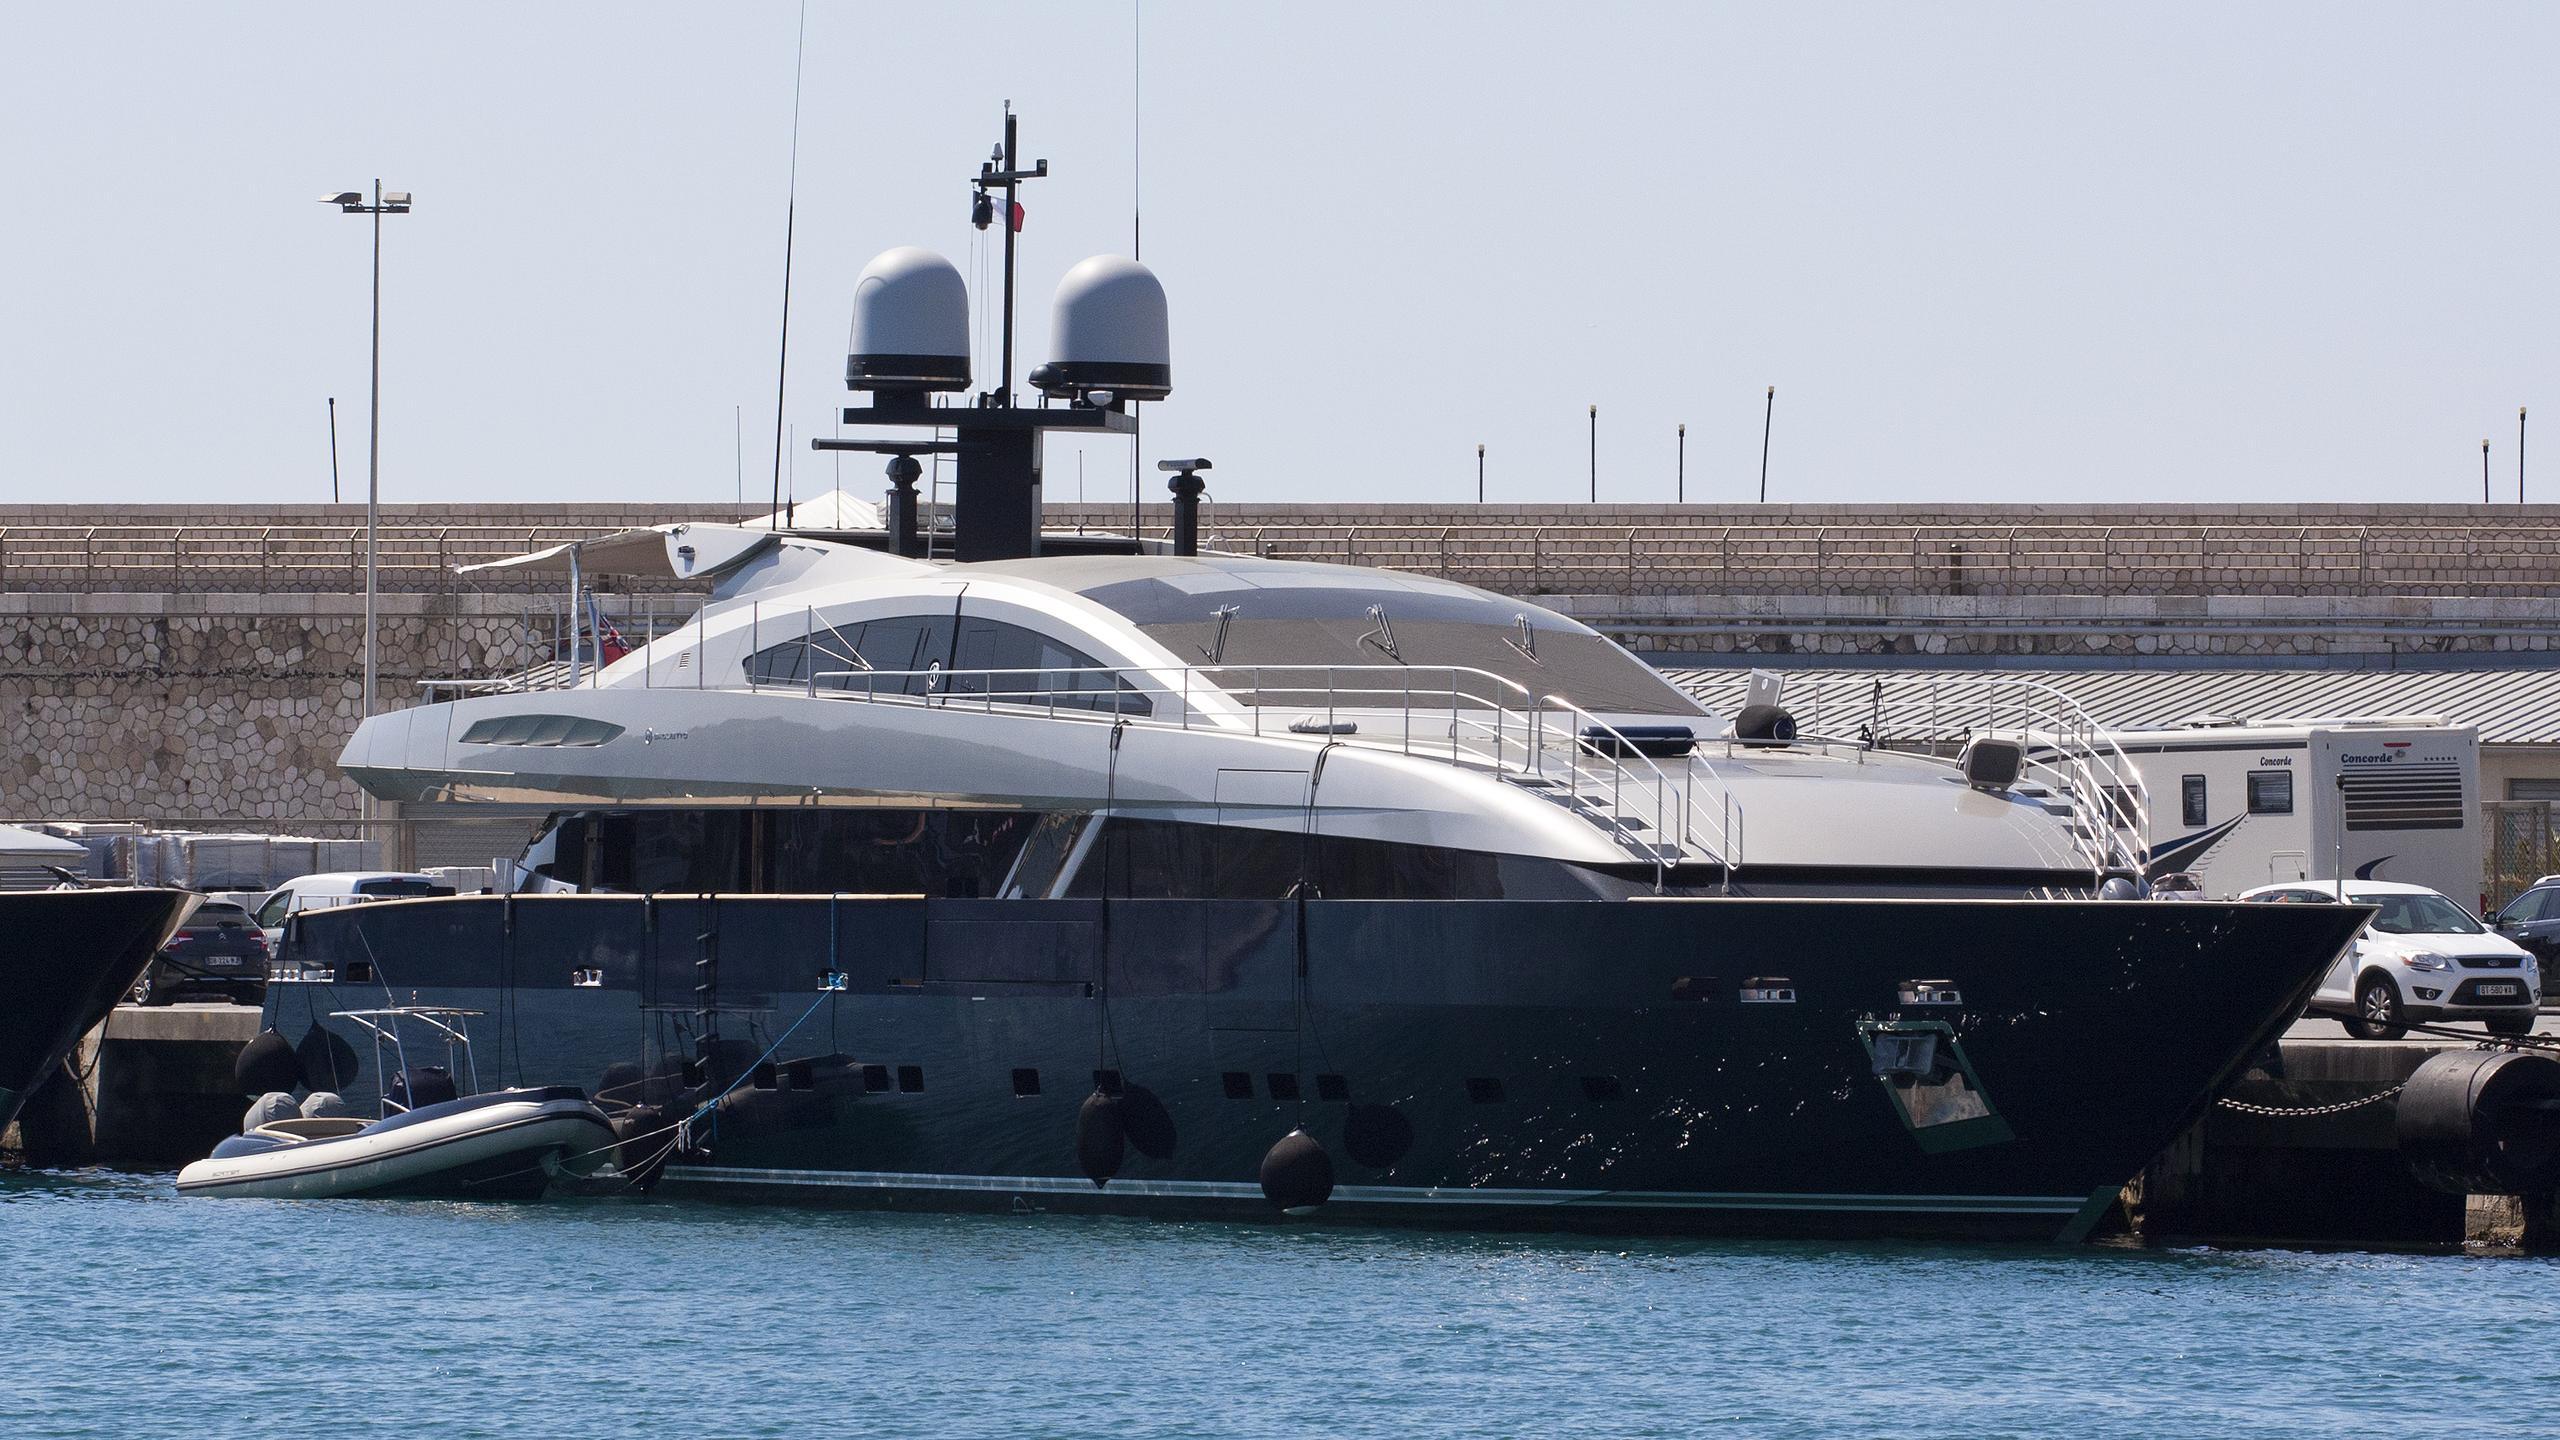 lucky-me-motor-yacht-baglietto-2010-42m-half-profile